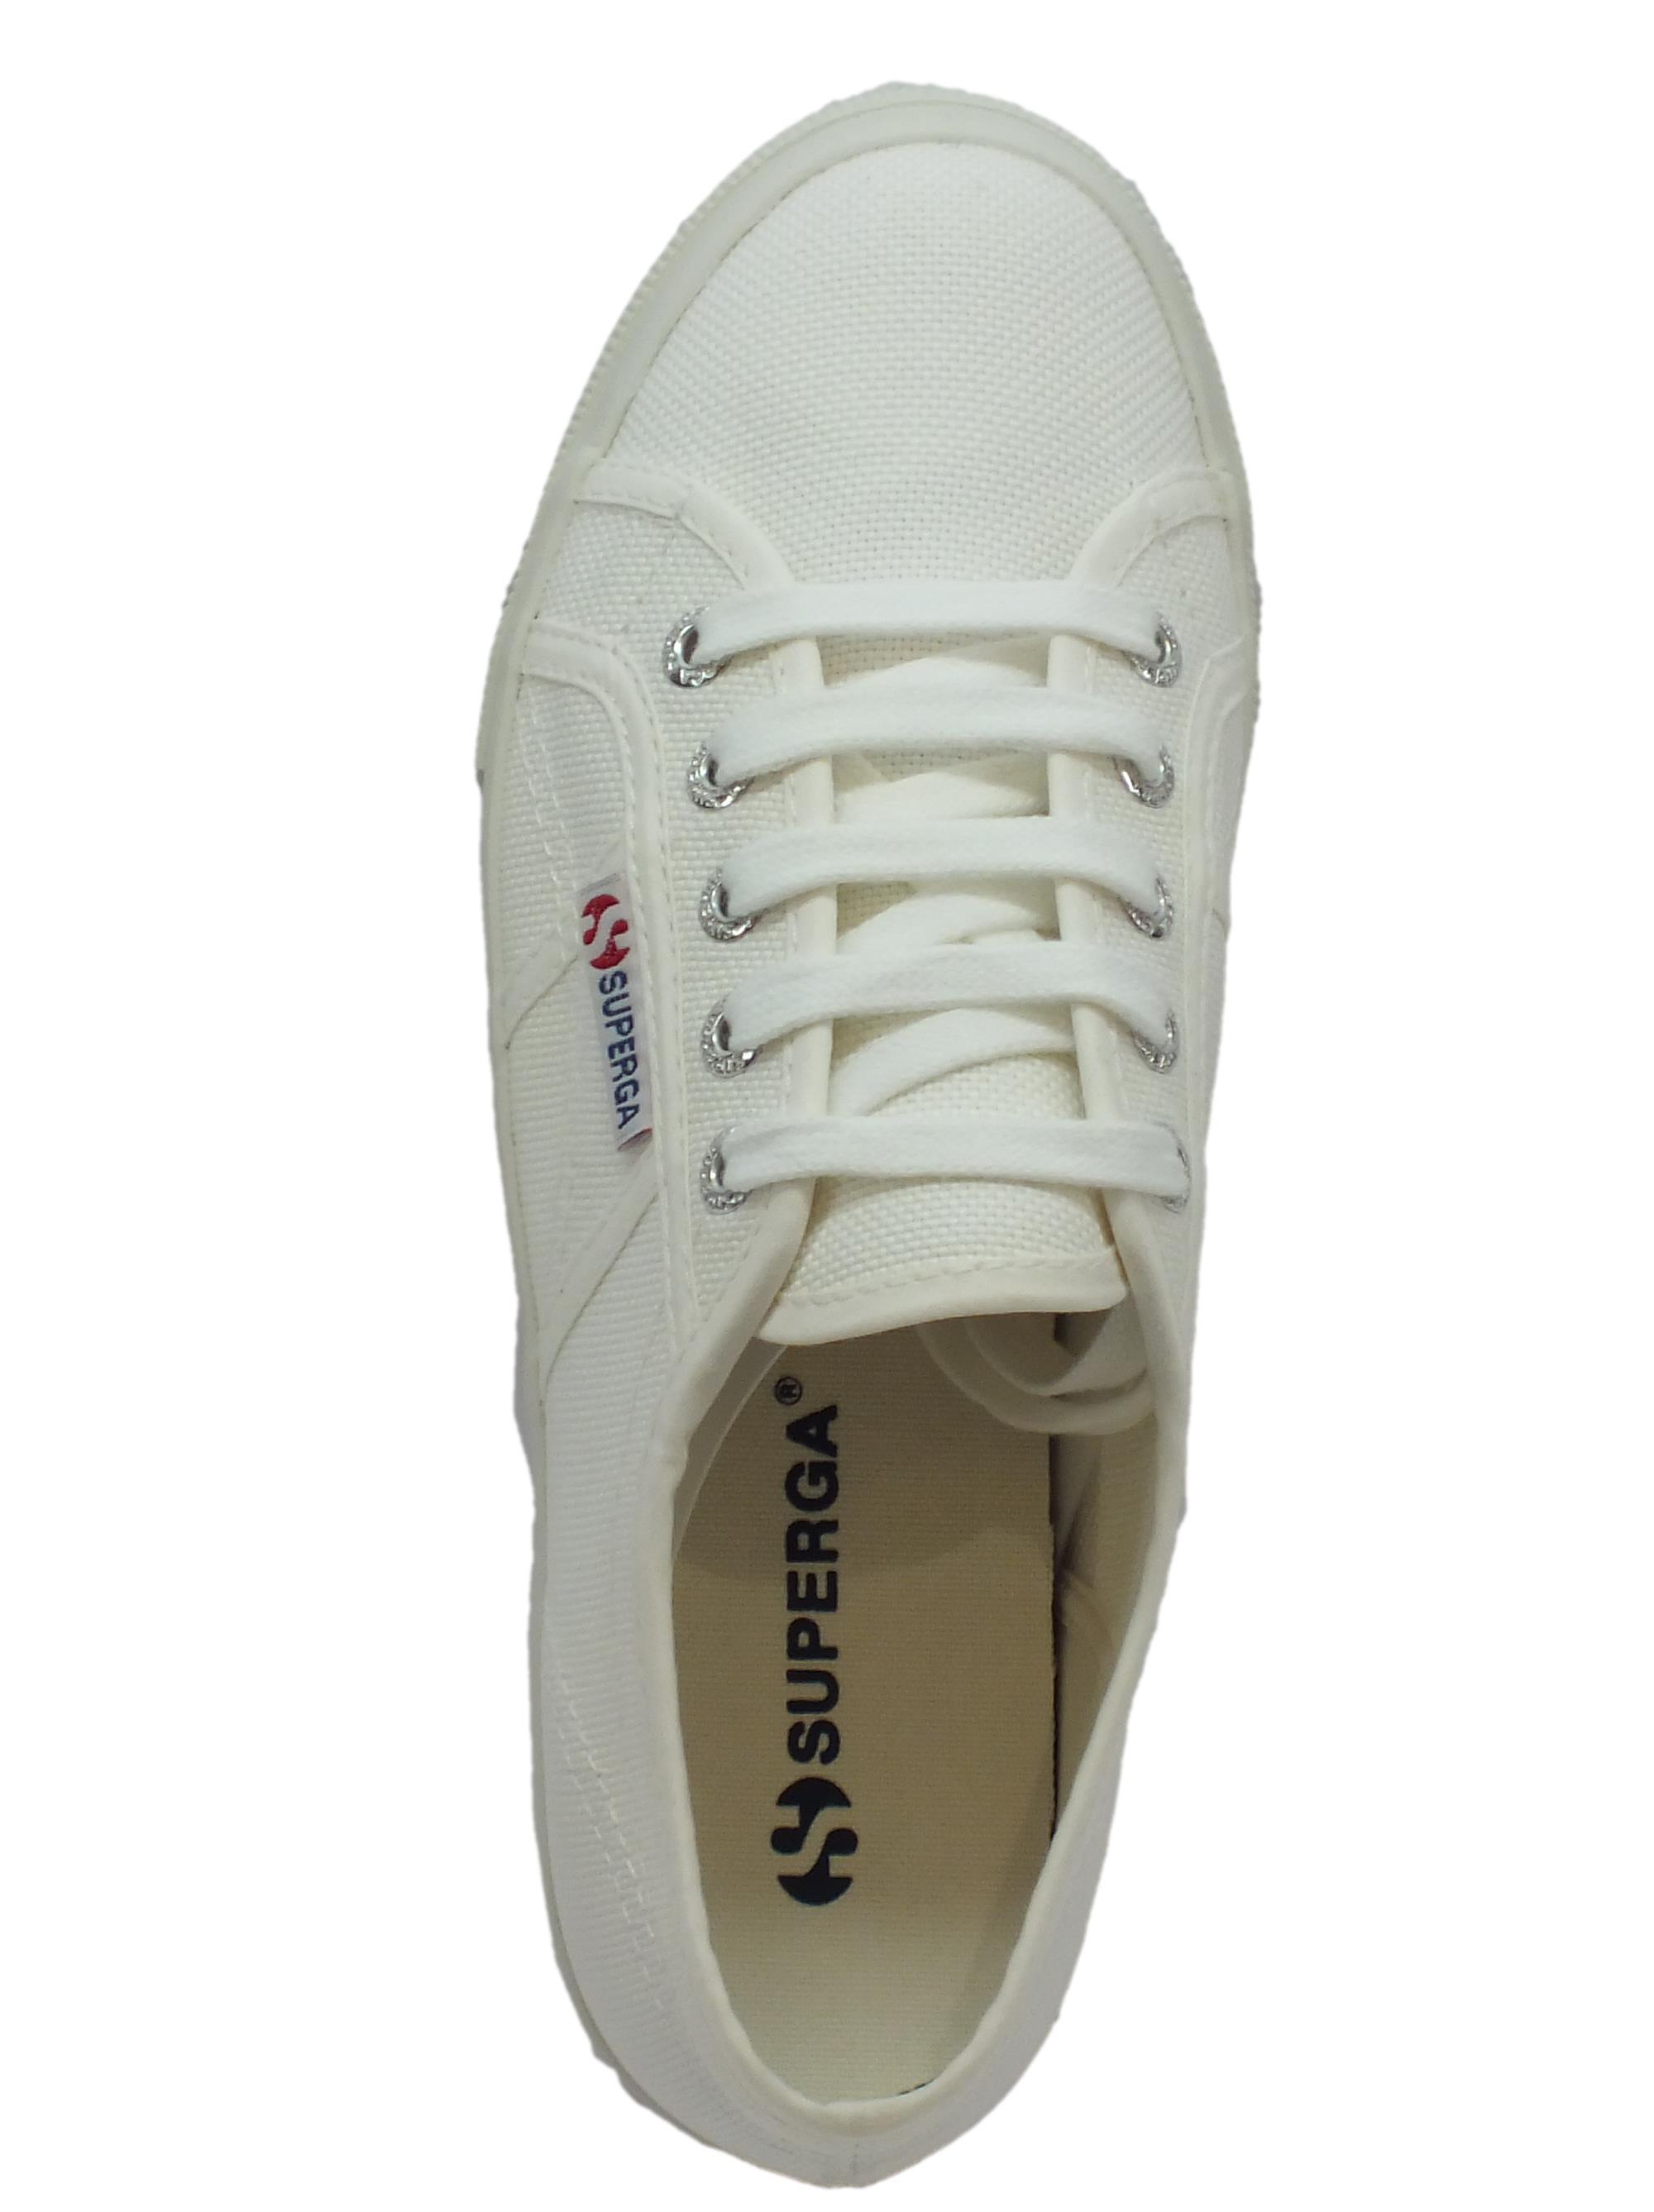 Scarpe sportive donna Superga donna sportive tessuto bianco zeppa media Vitiello   526be7